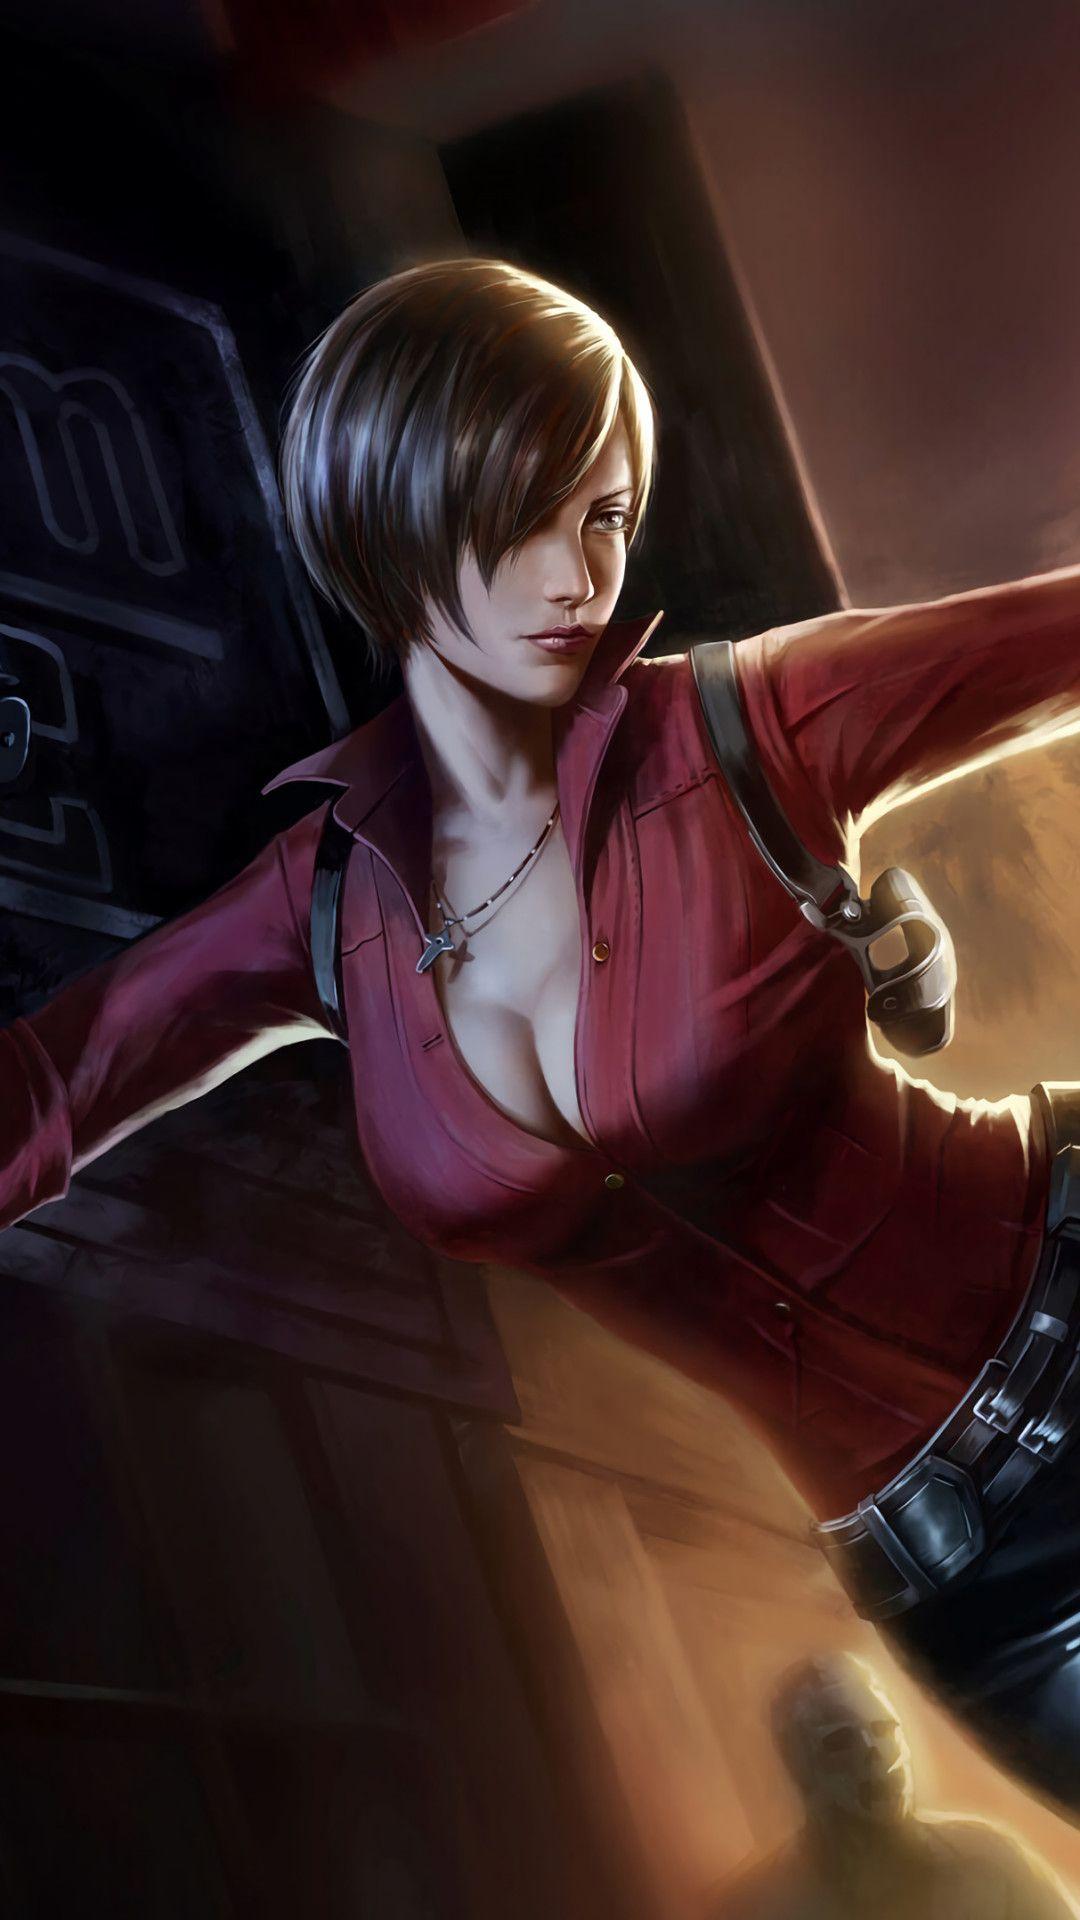 Ada Wong Resident Evil 2 4k Art Mobile Wallpaper Iphone Android